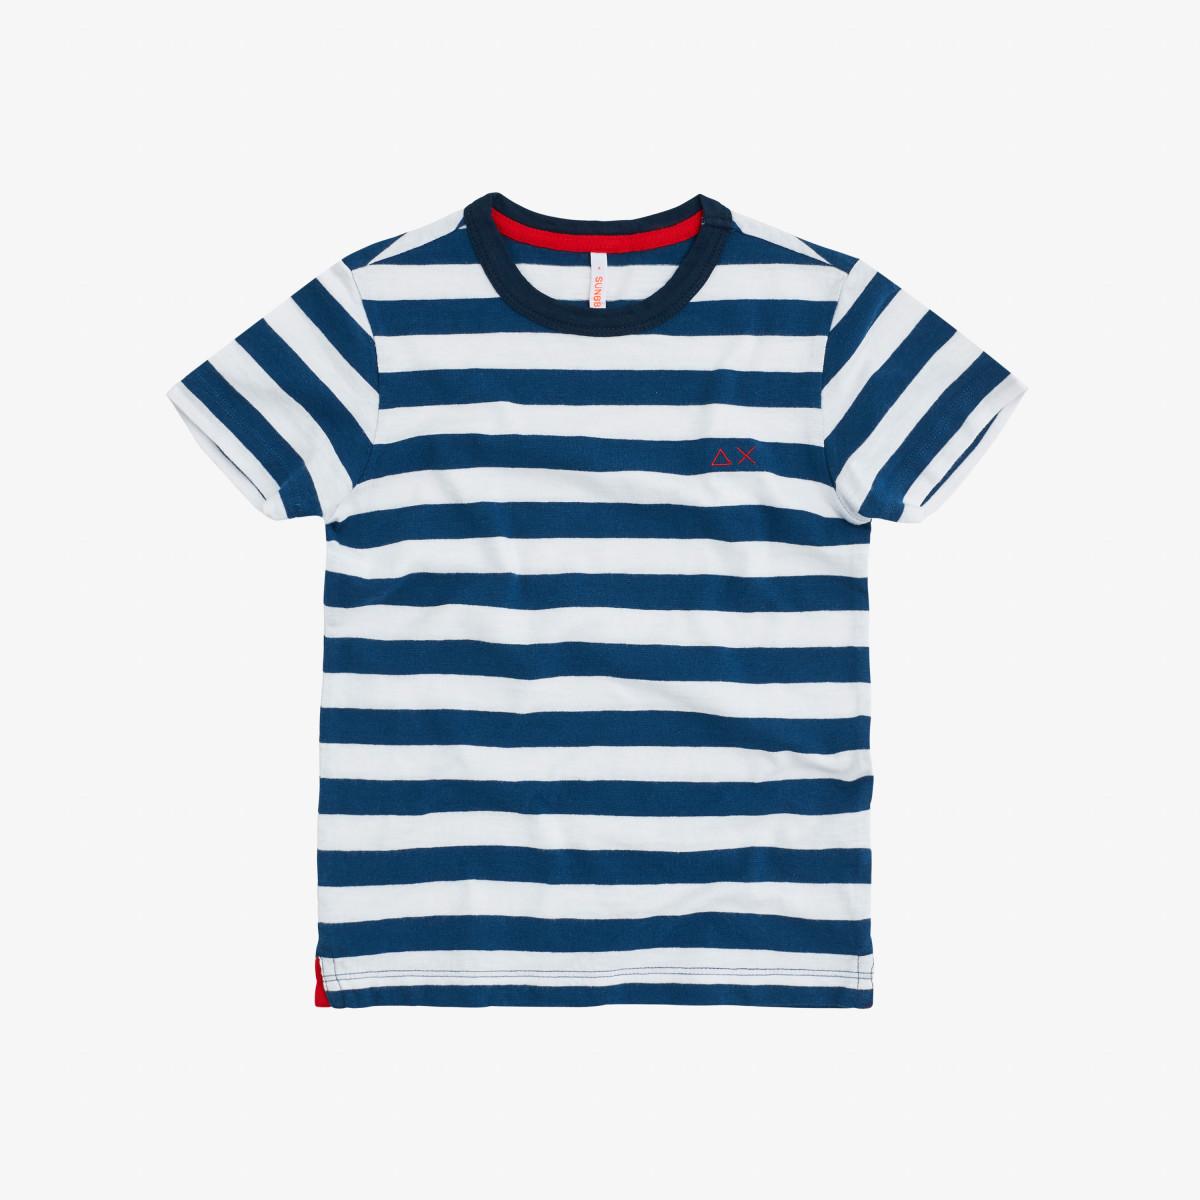 BOY'S T-SHIRT ROUND FULL STRIPES BLUE/WHITE